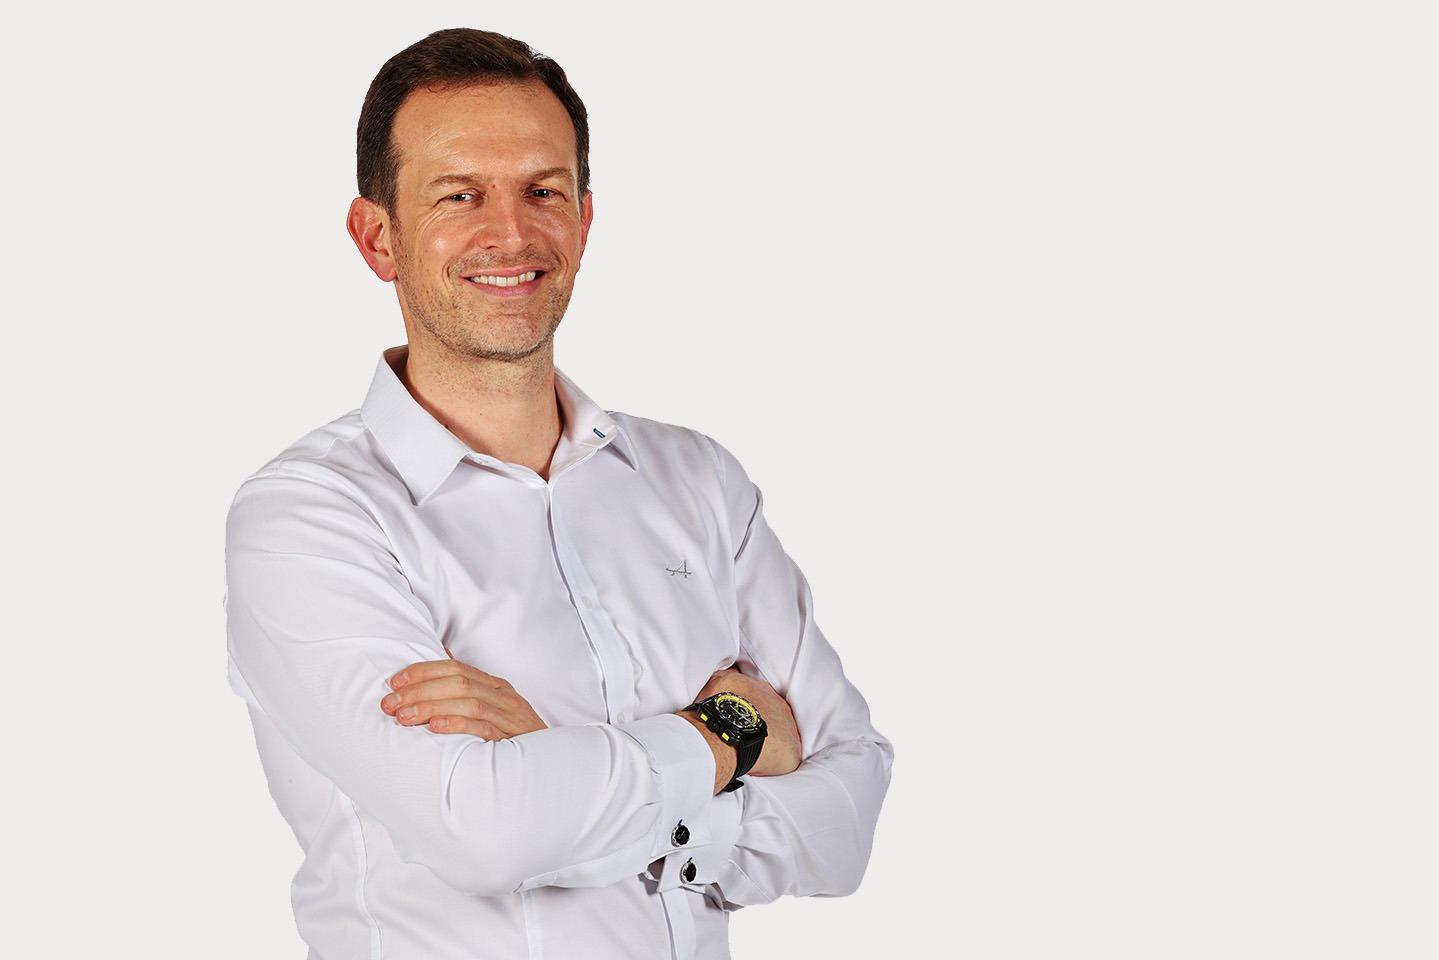 Laurent Rossi, Alpine Chief Executive Officer